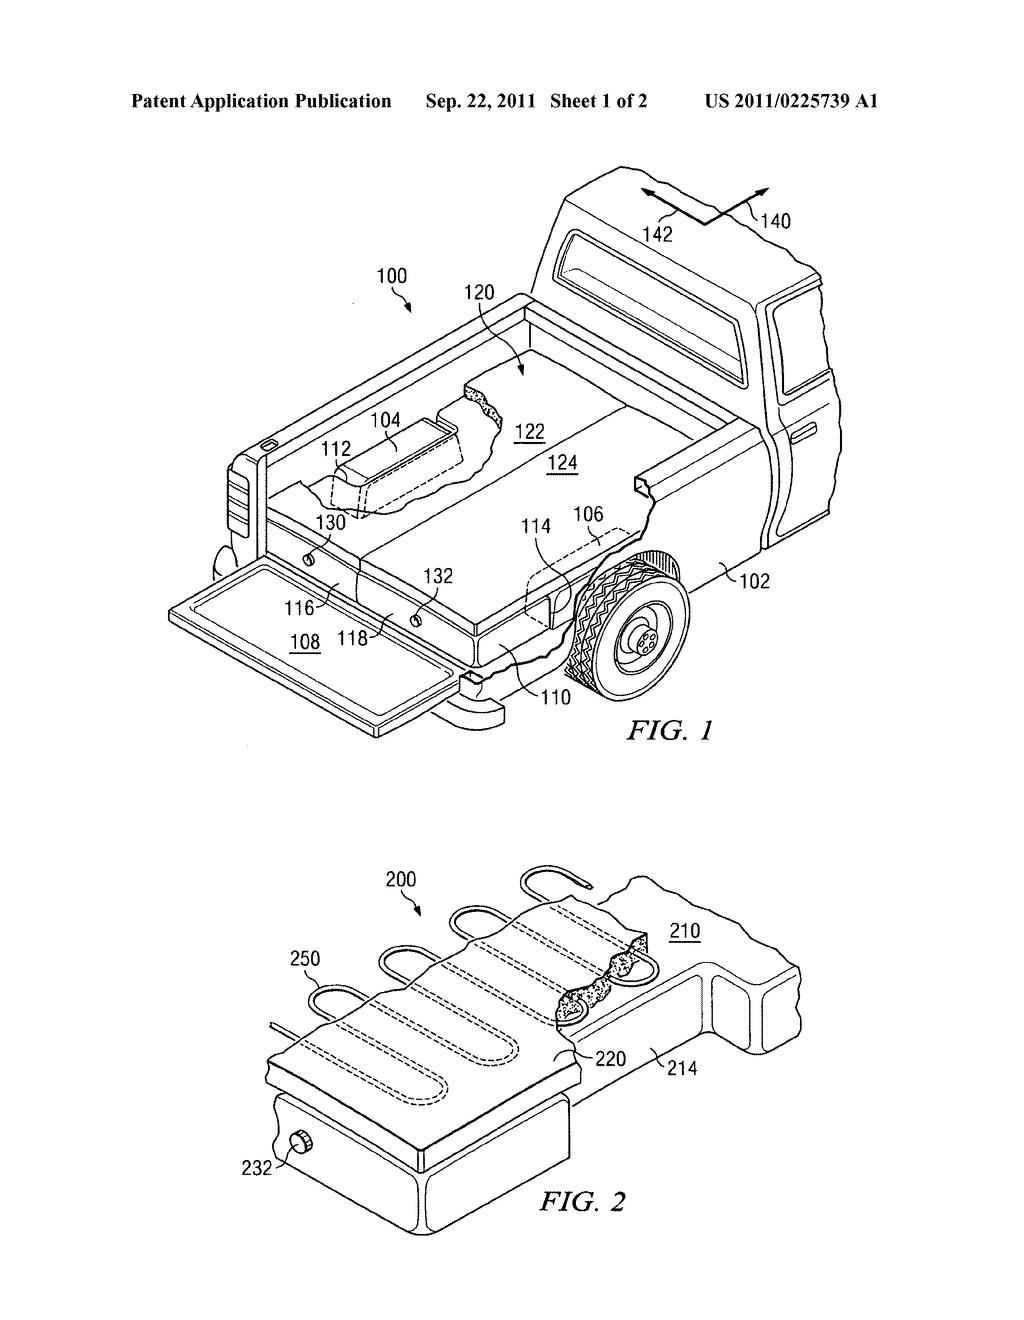 1964 C20 Chevy Truck Wiring Diagram. Chevy. Auto Wiring